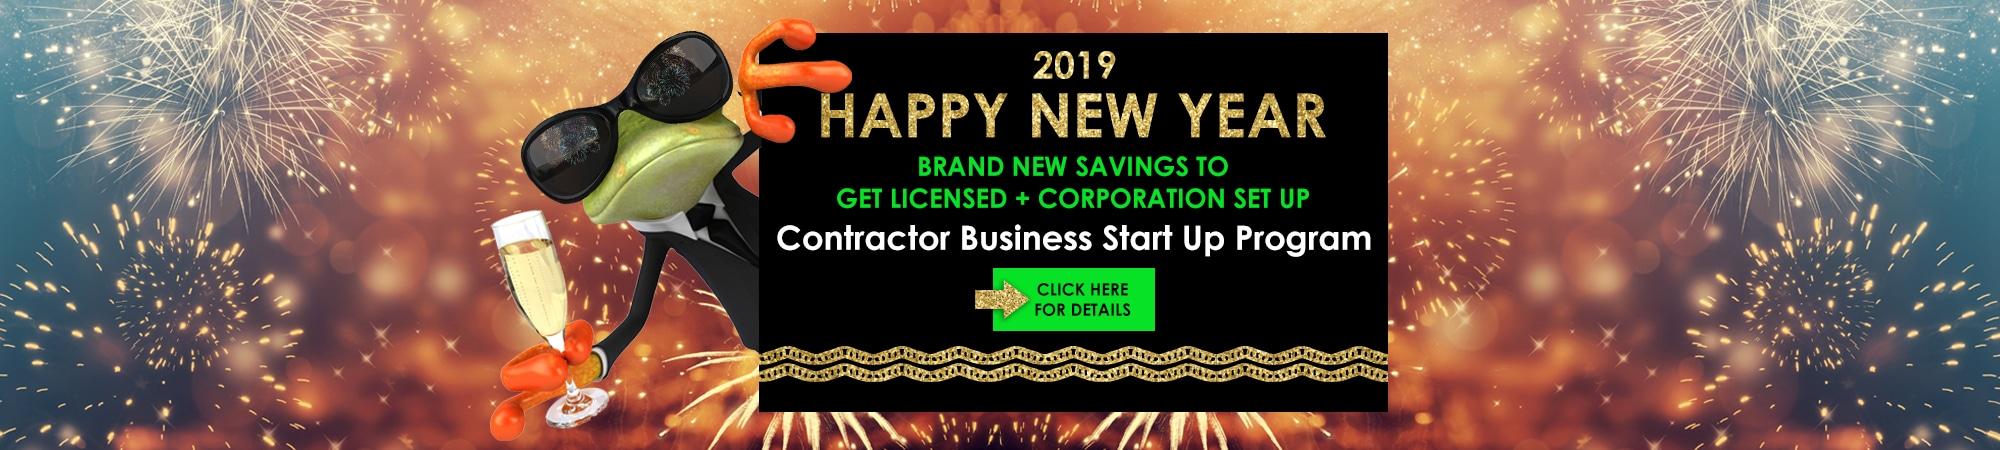 CSLS-New-Year-2018-Promo-Homepage-Banner